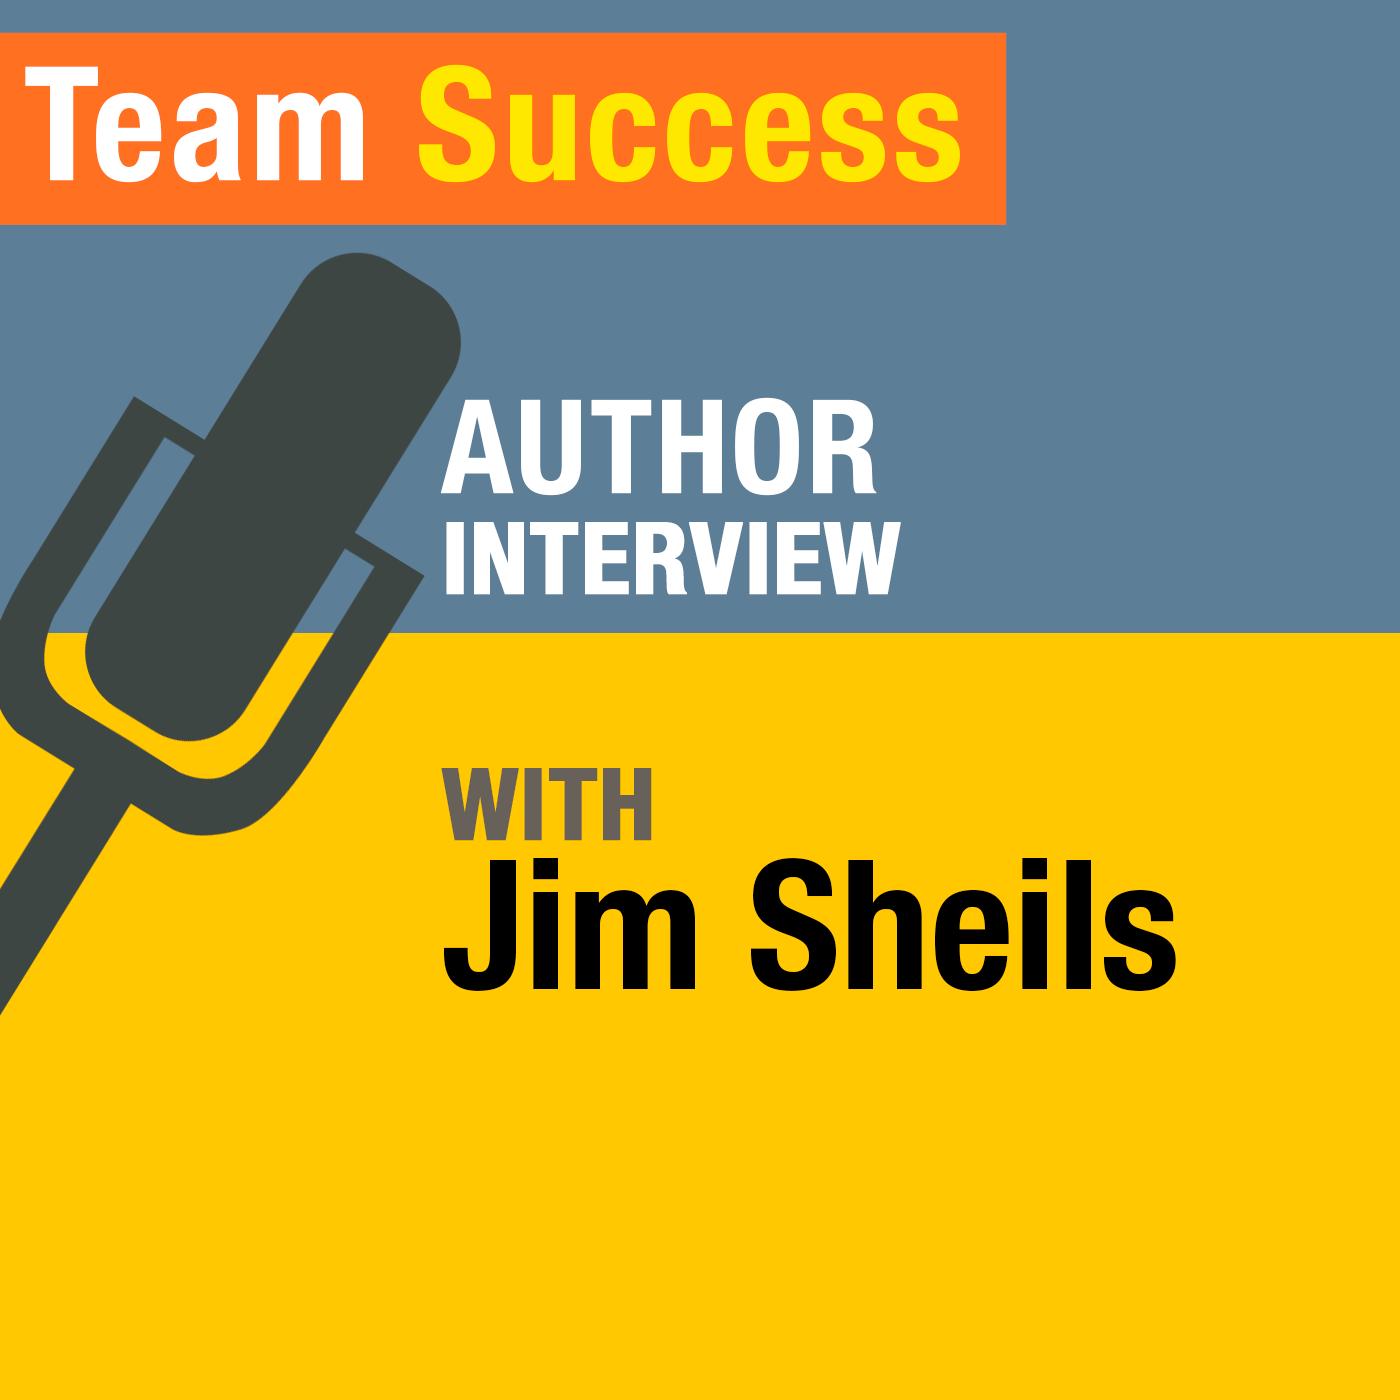 An Interview With Jim Sheils - Team Success Podcast